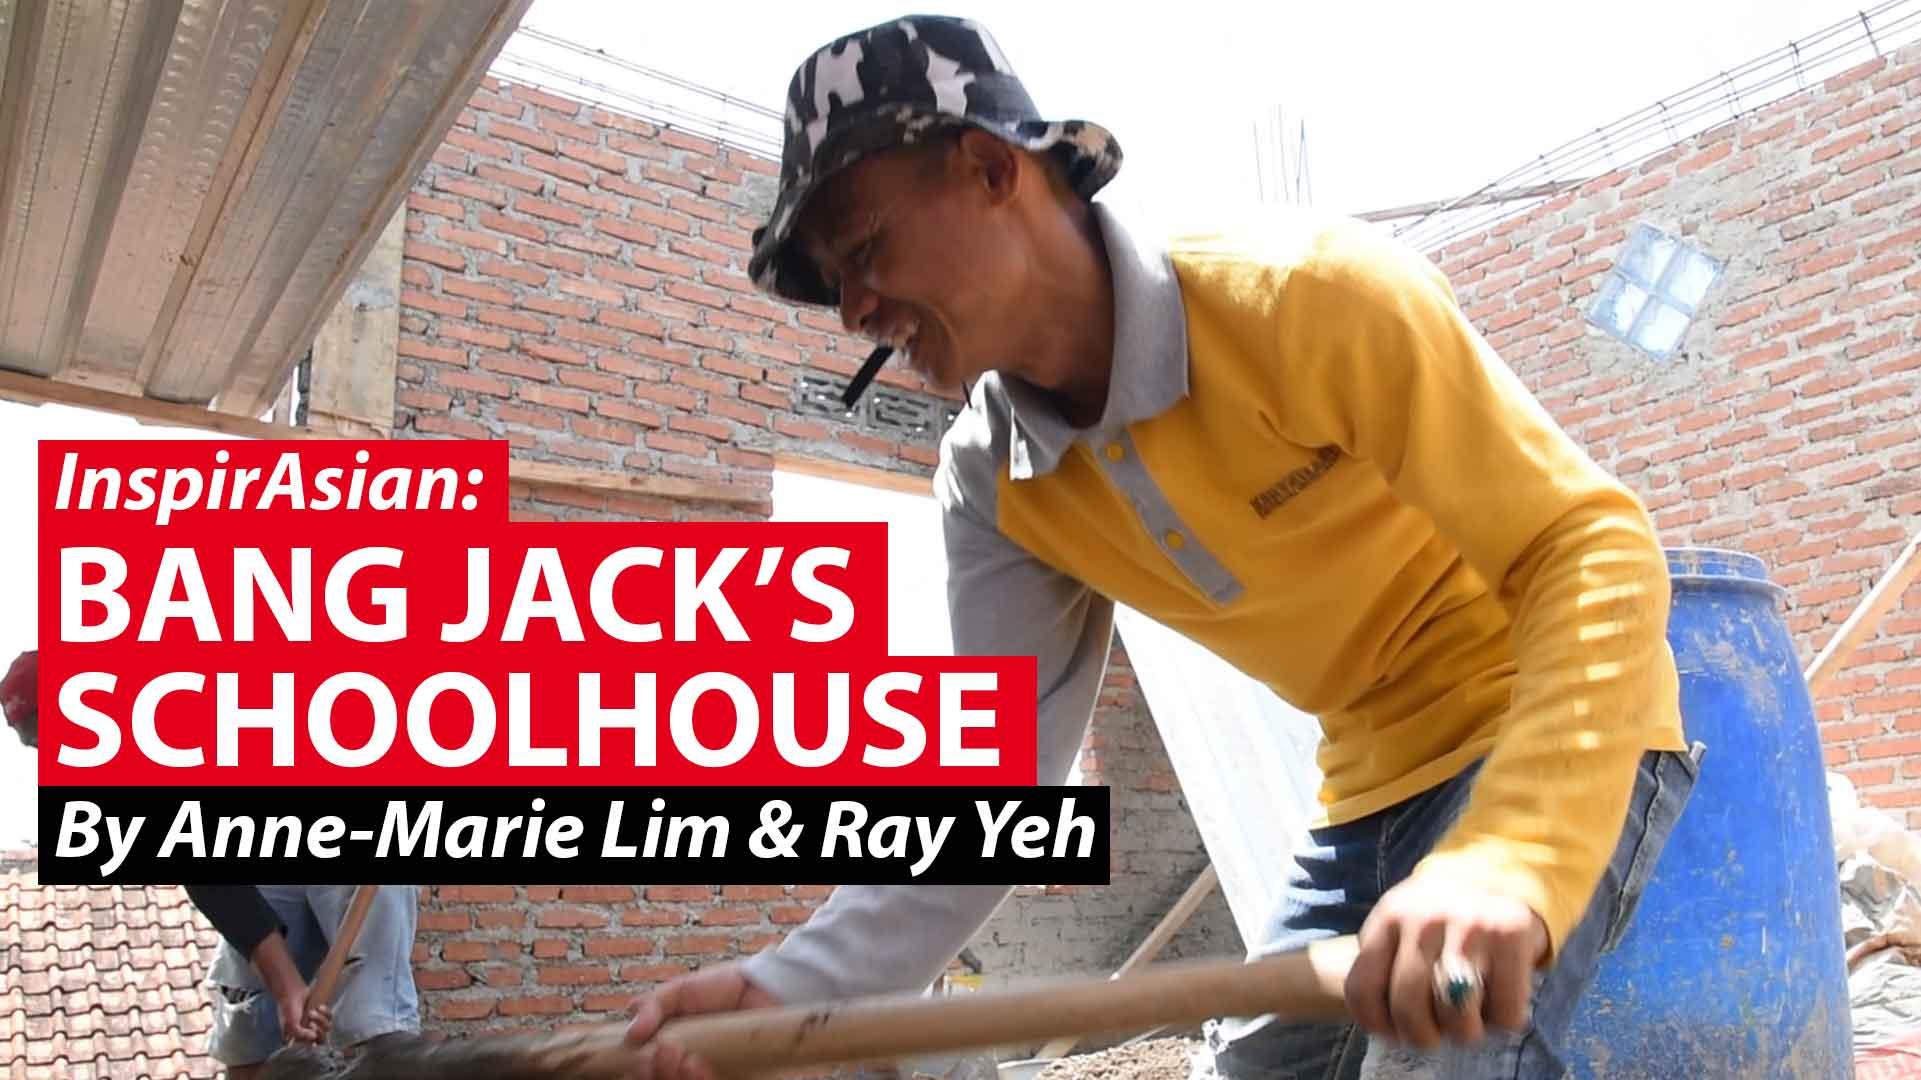 Bang Jack's schoolhouse